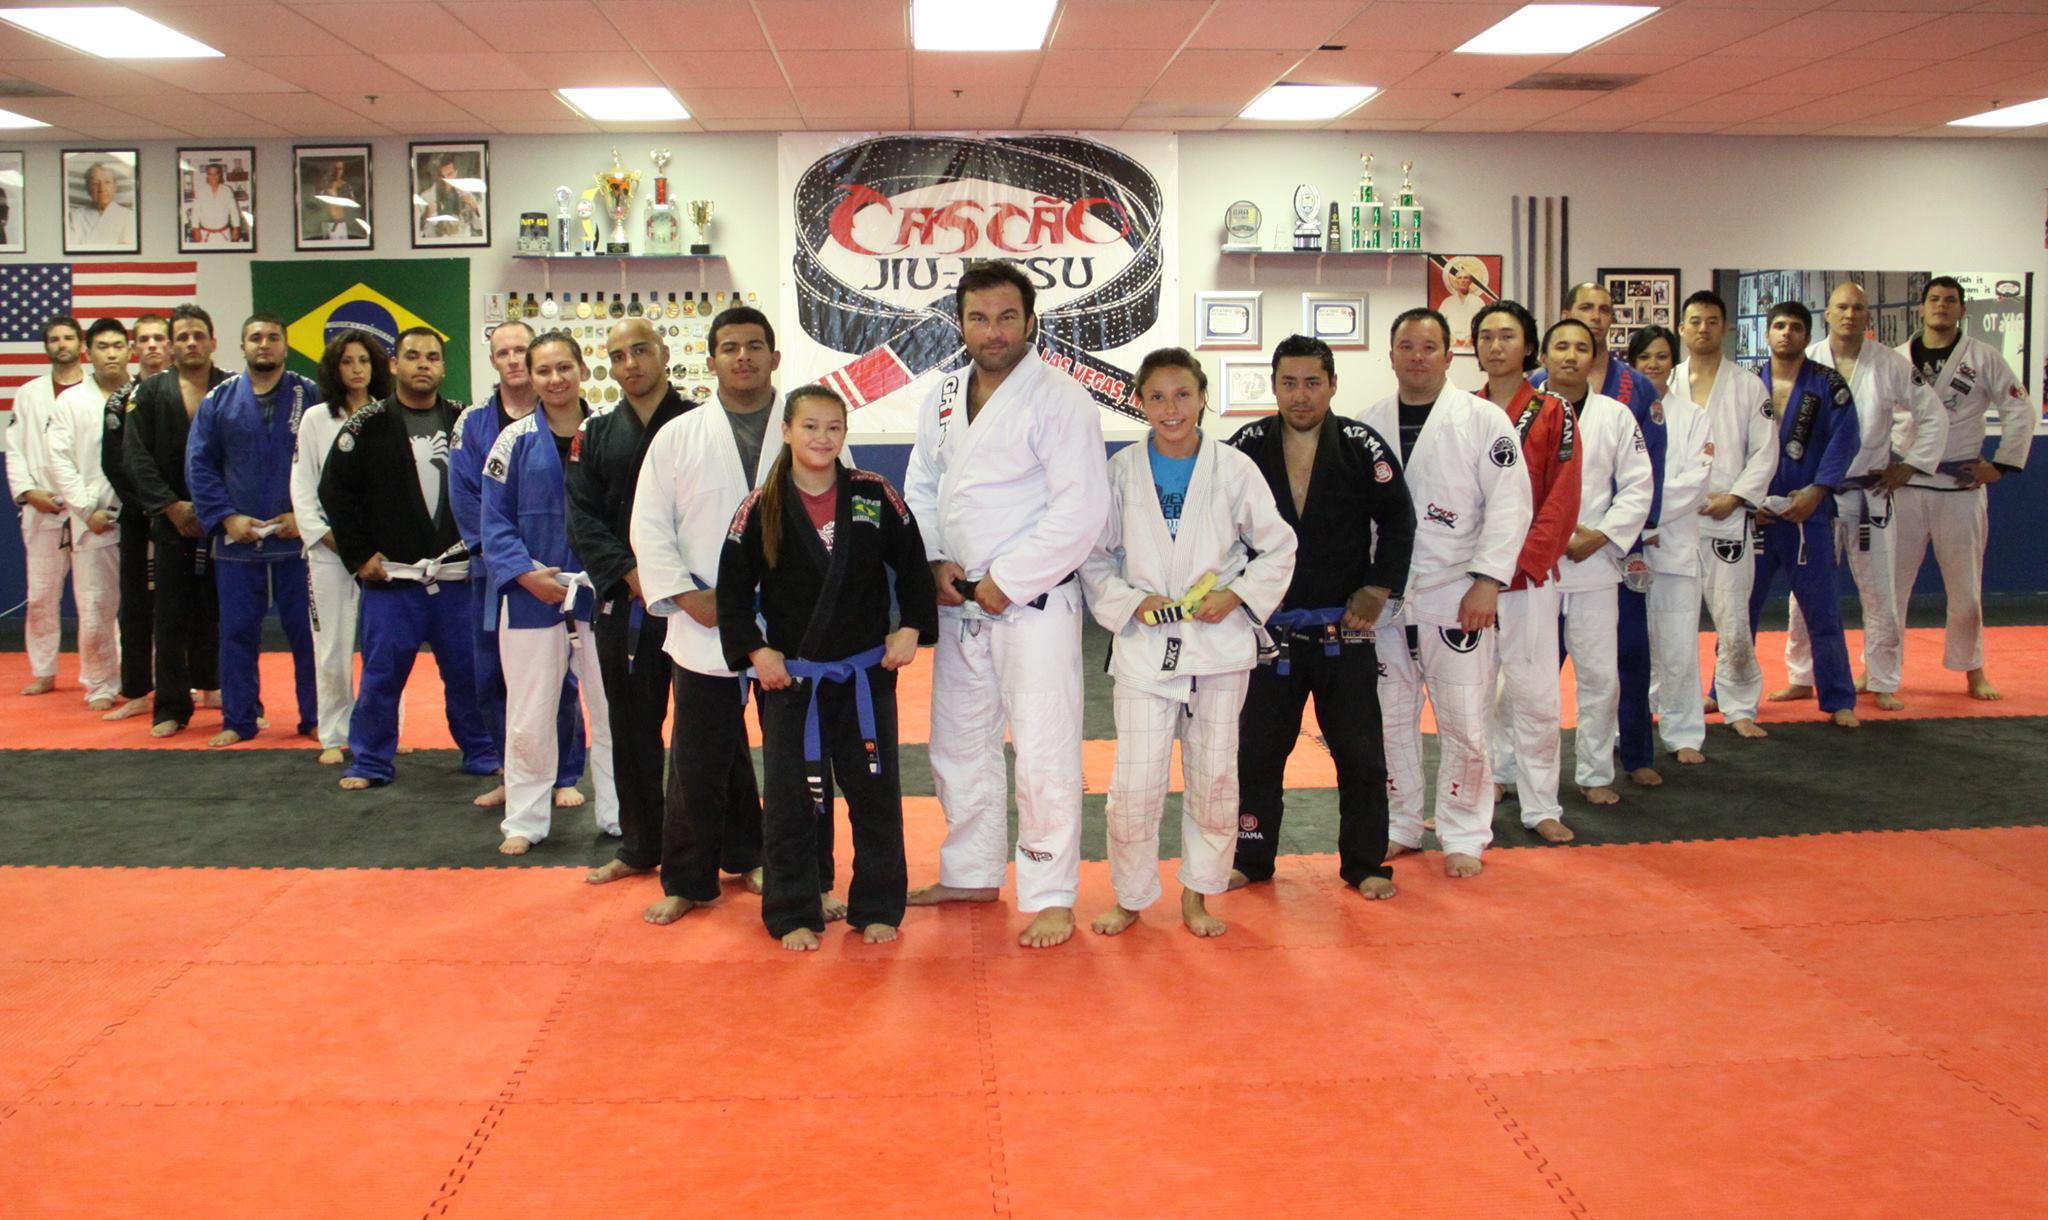 The Cascao Jiu-Jitsu team ready for the Vegas Summer Open. Photo: Personal Archive